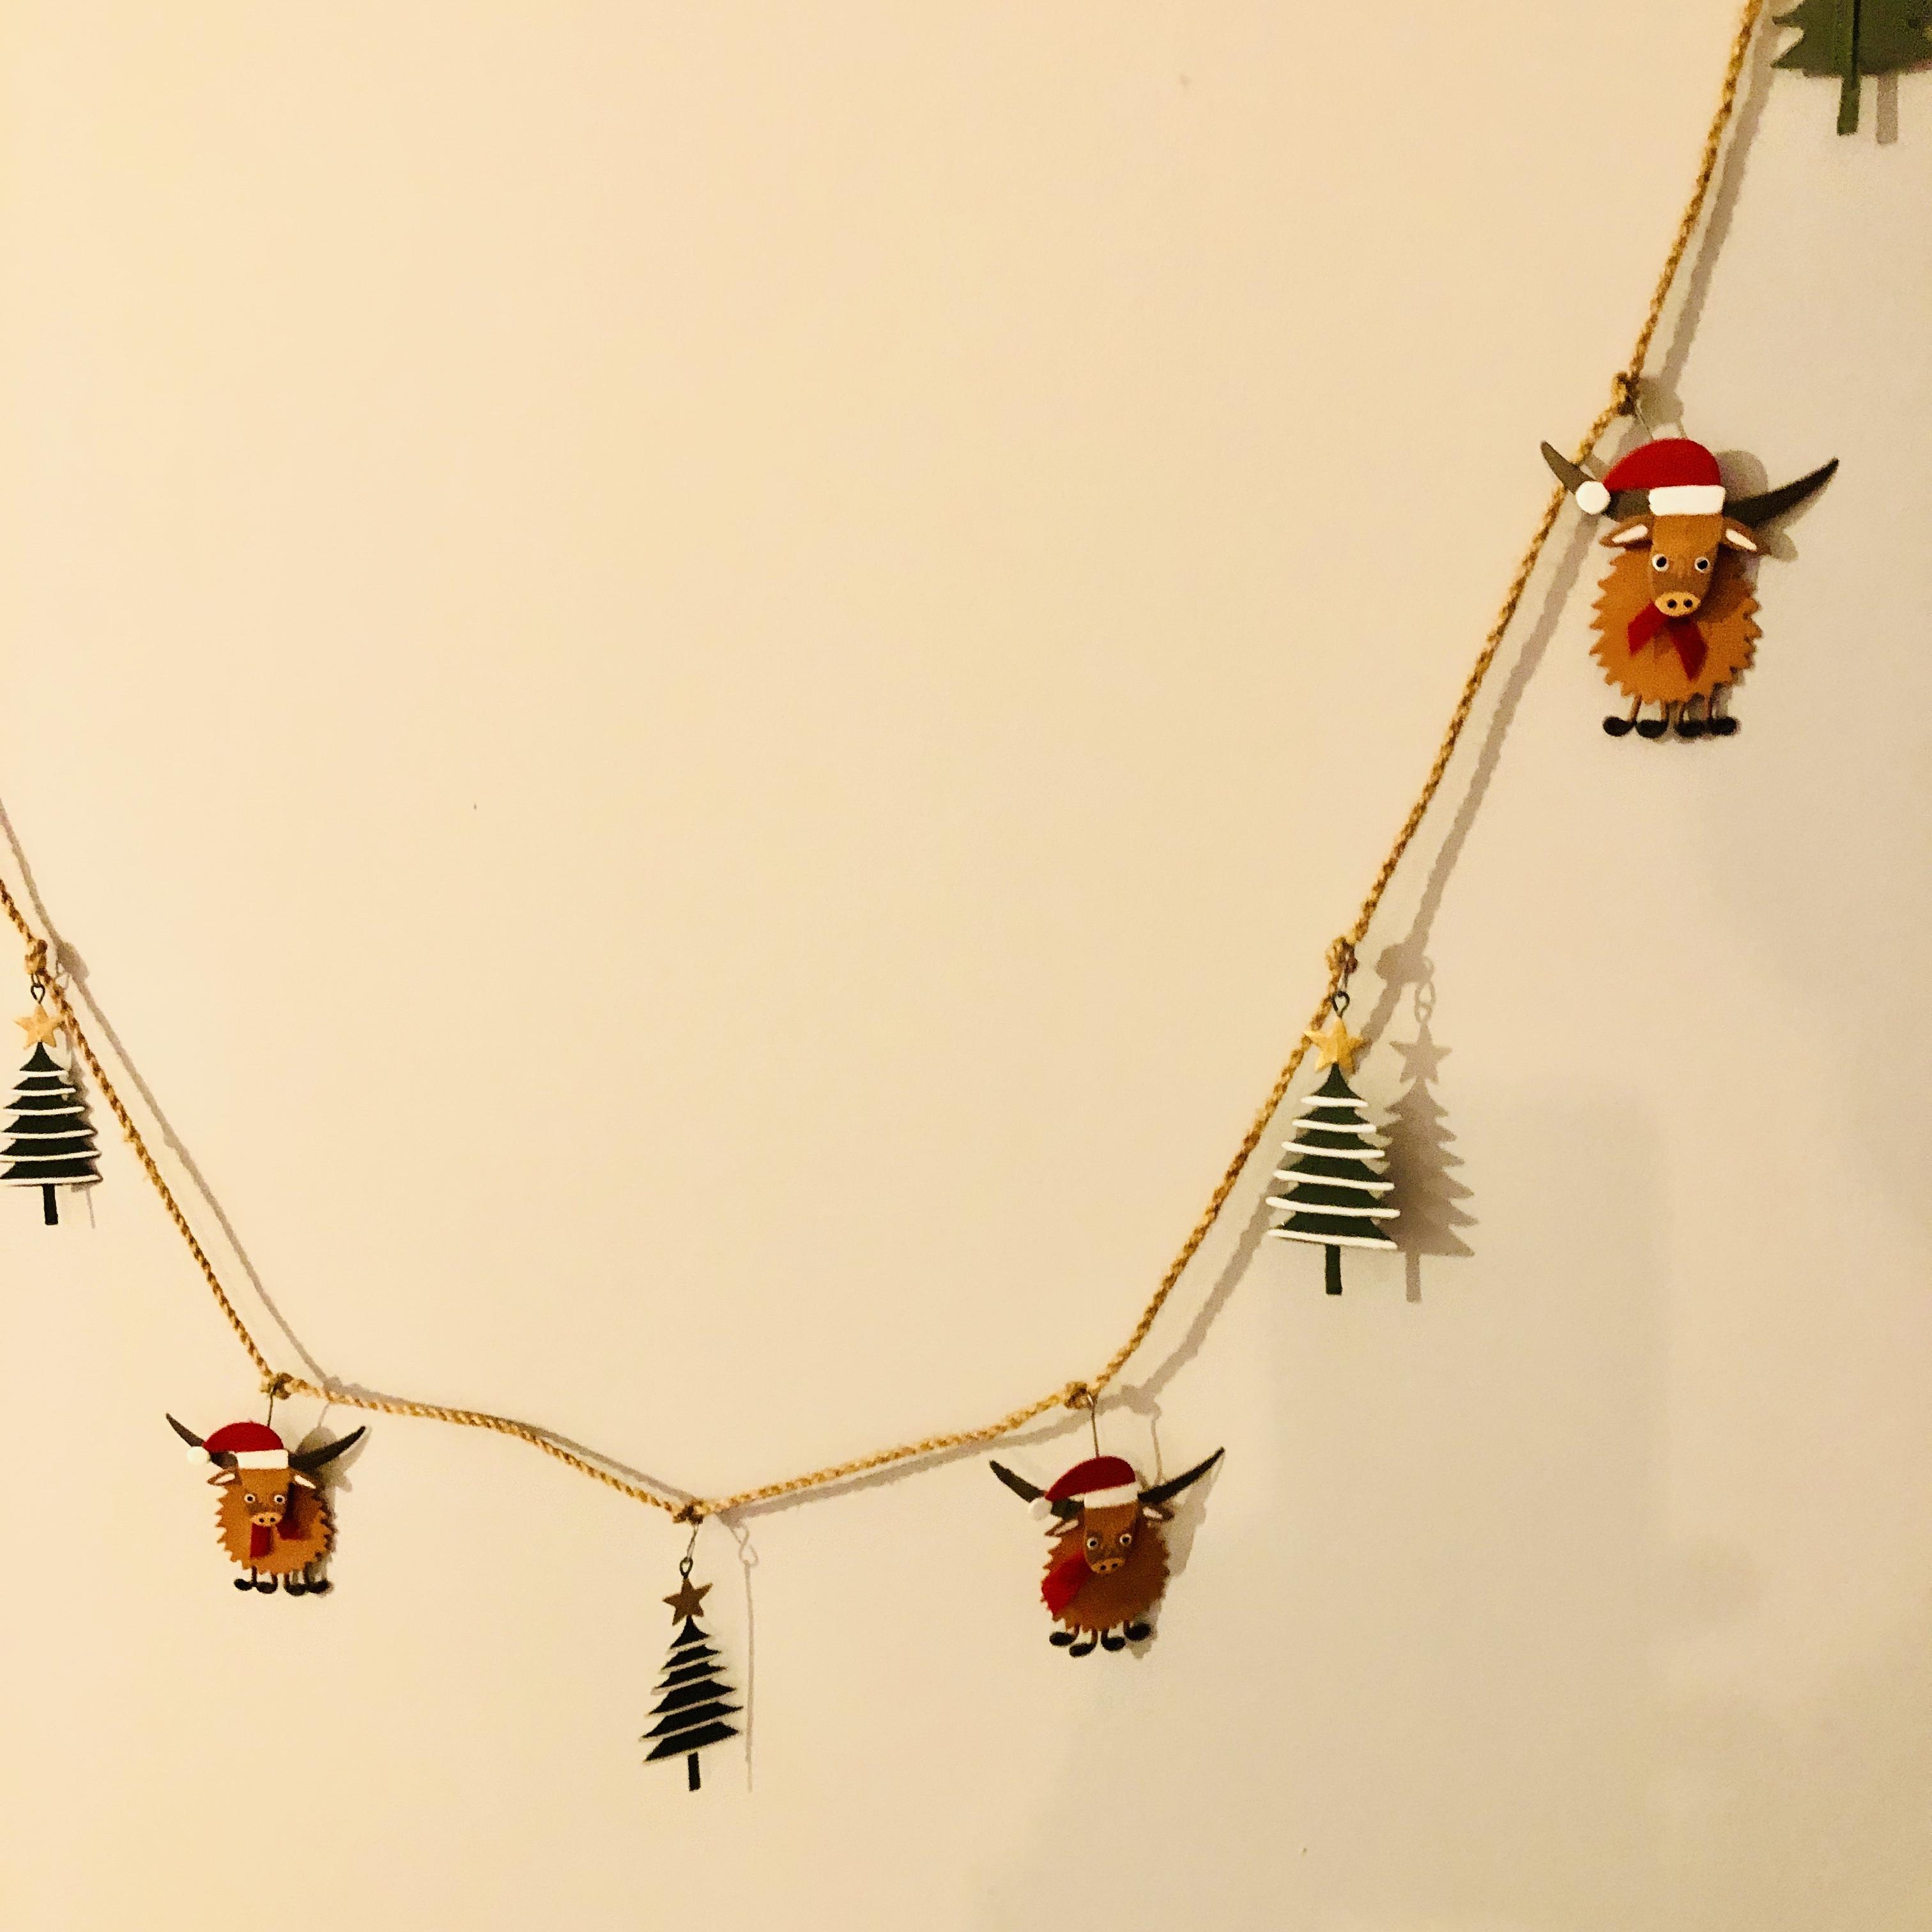 Highland cow & Christmas tree hanging garland.  Christmas decoration by shoeless joe